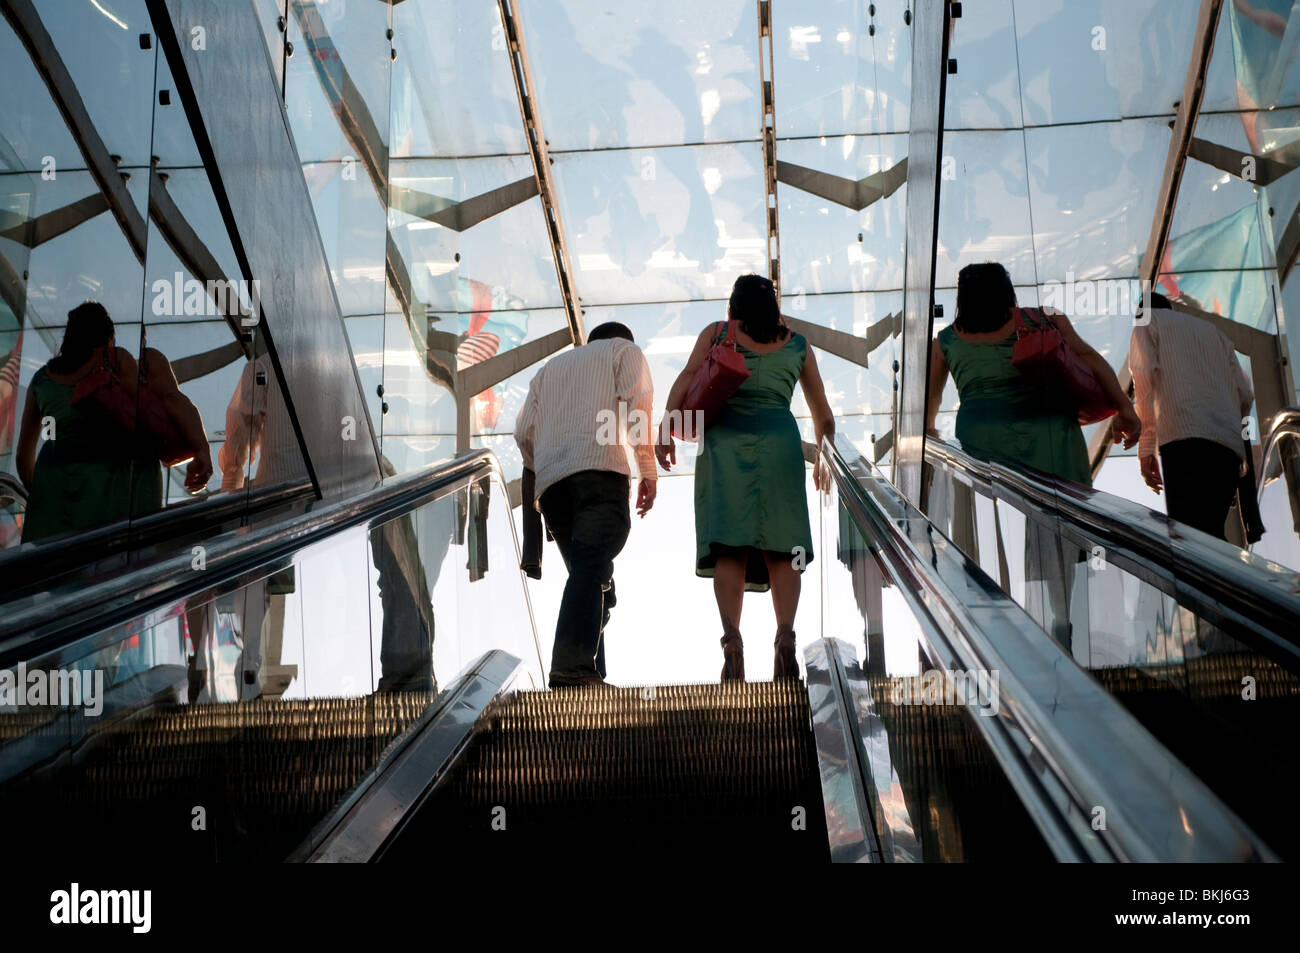 Couple at the top of the escalator, Sydney, Australia - Stock Image